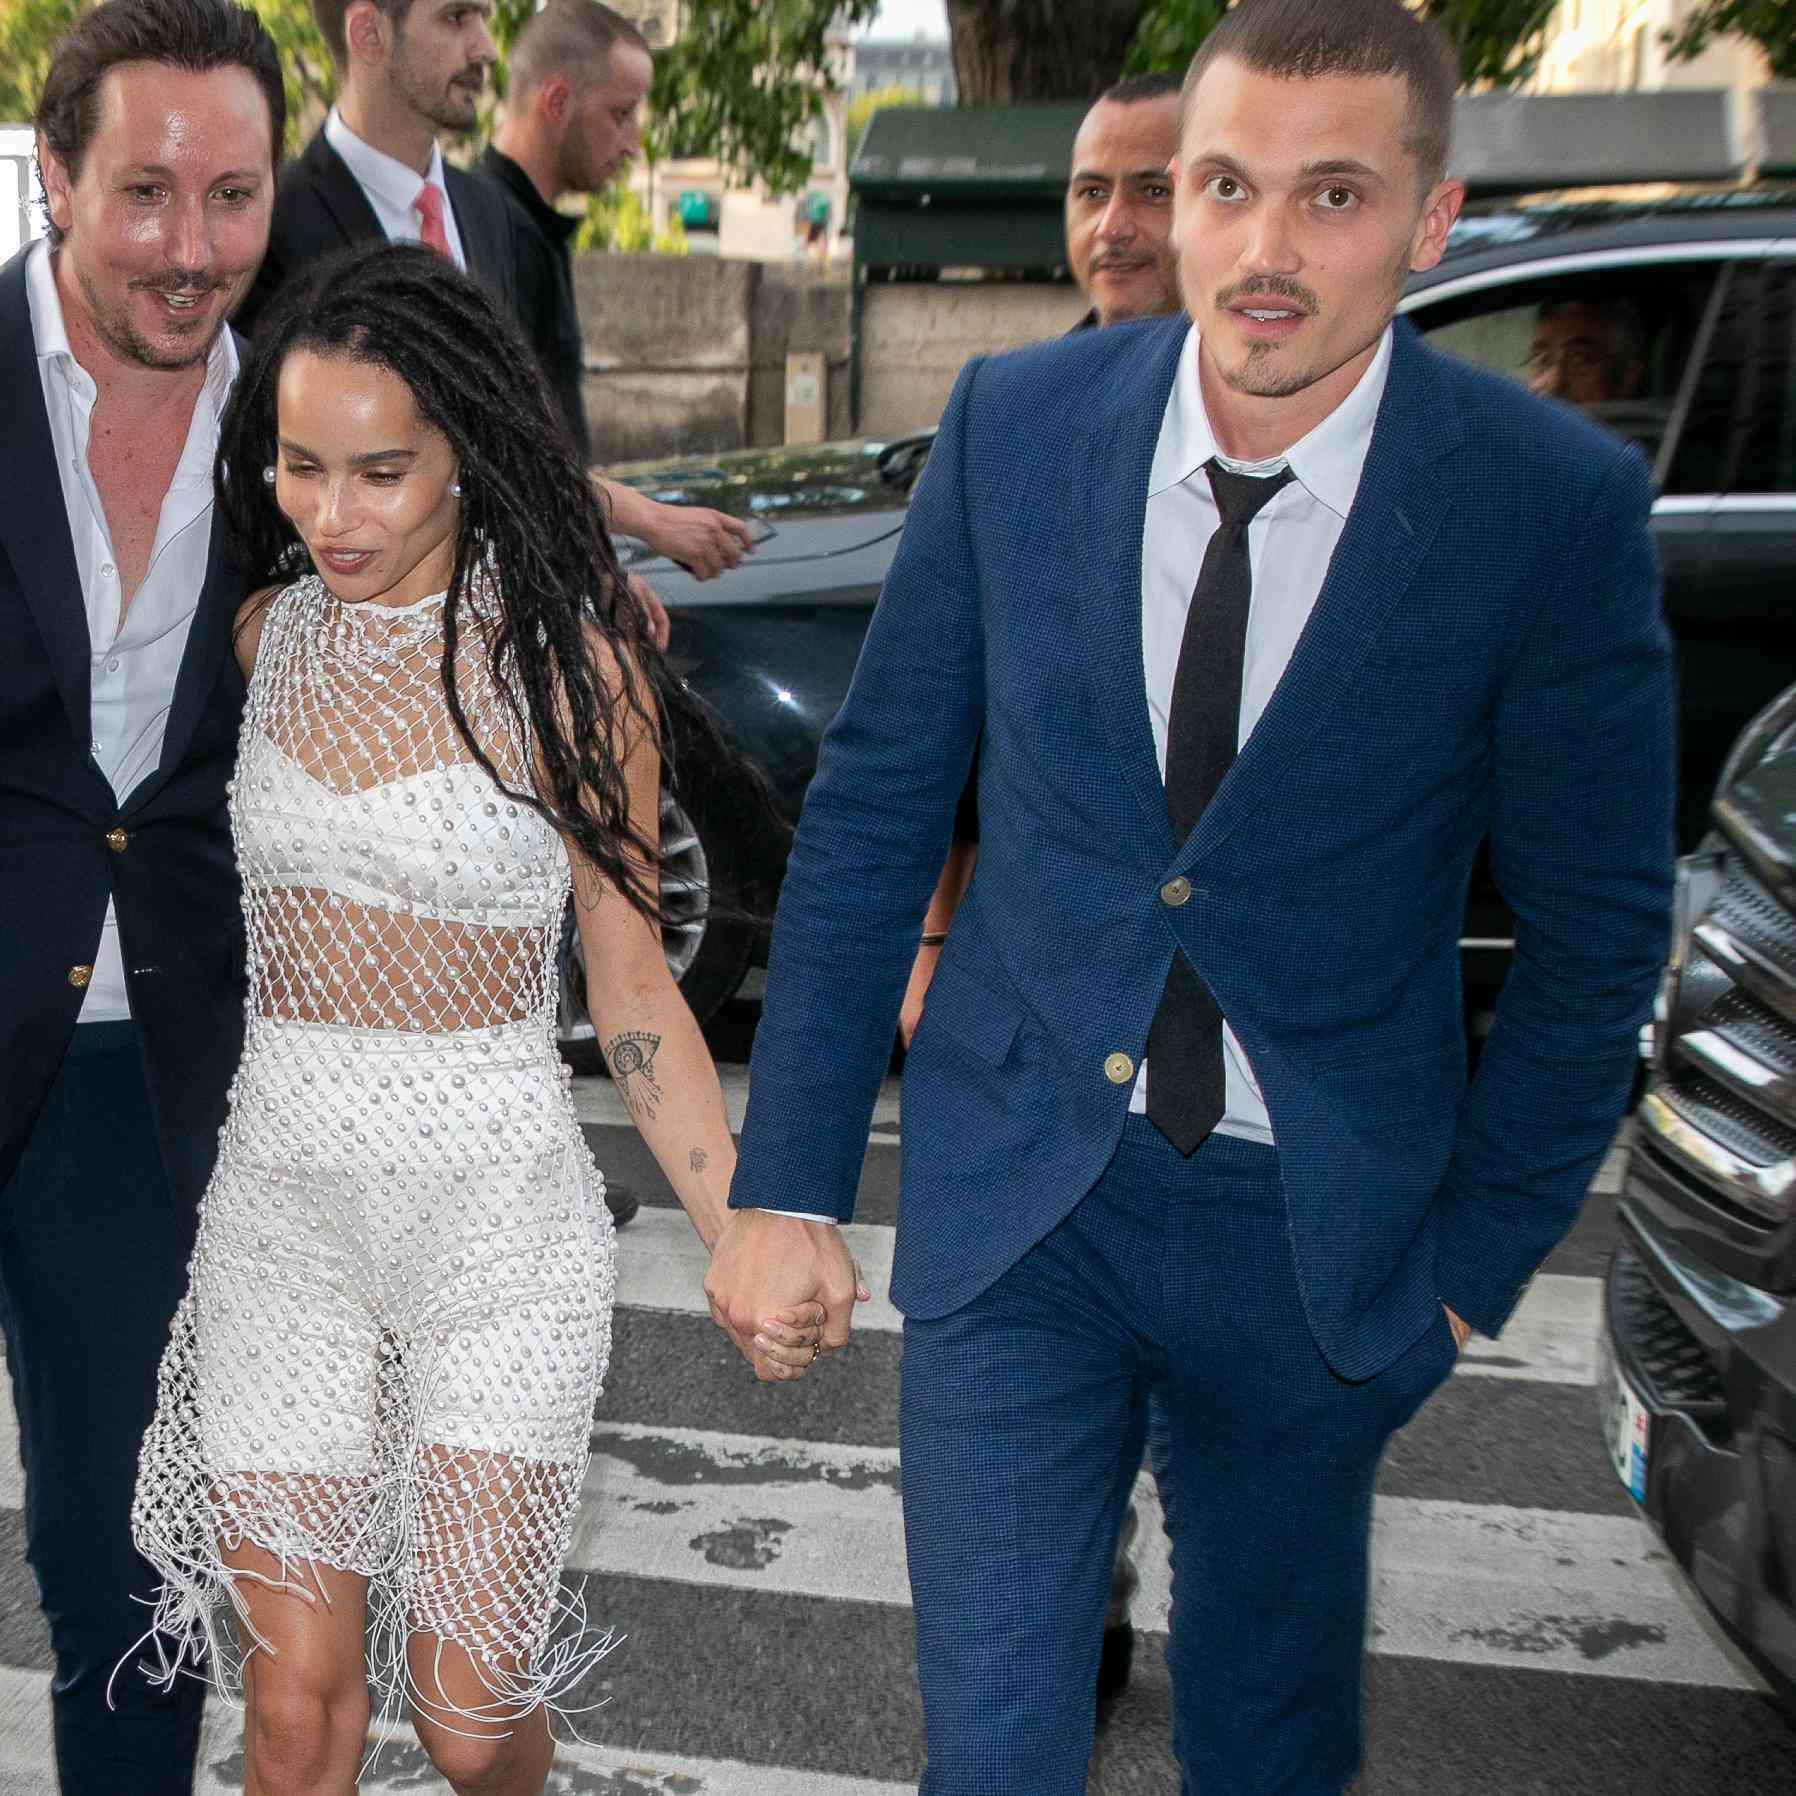 Celebrity Weddings 2019: All Of 2019's Celebrity Weddings